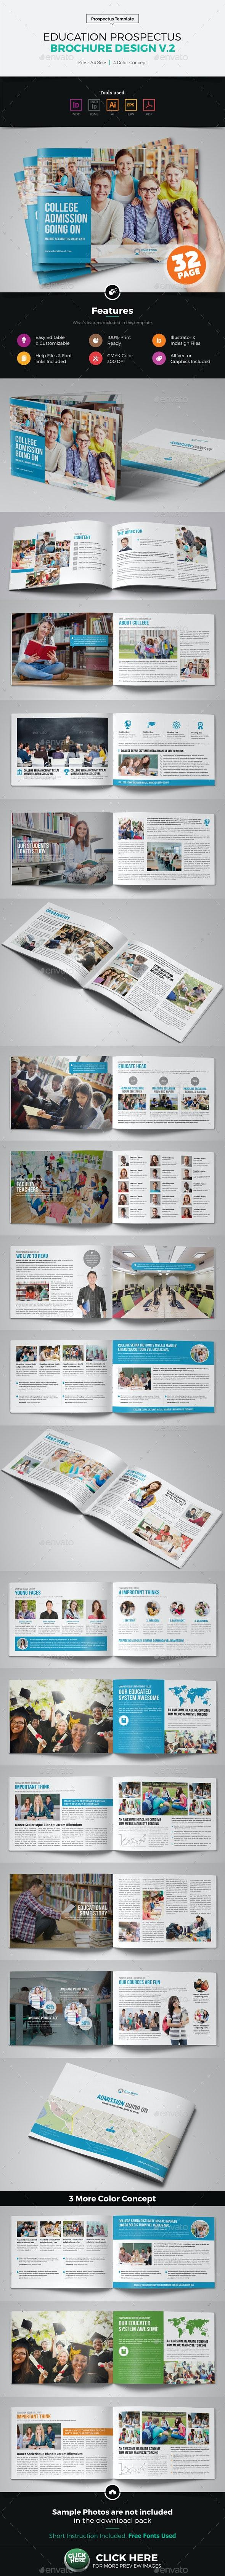 Education Prospectus Brochure Design v2 - Corporate Brochures